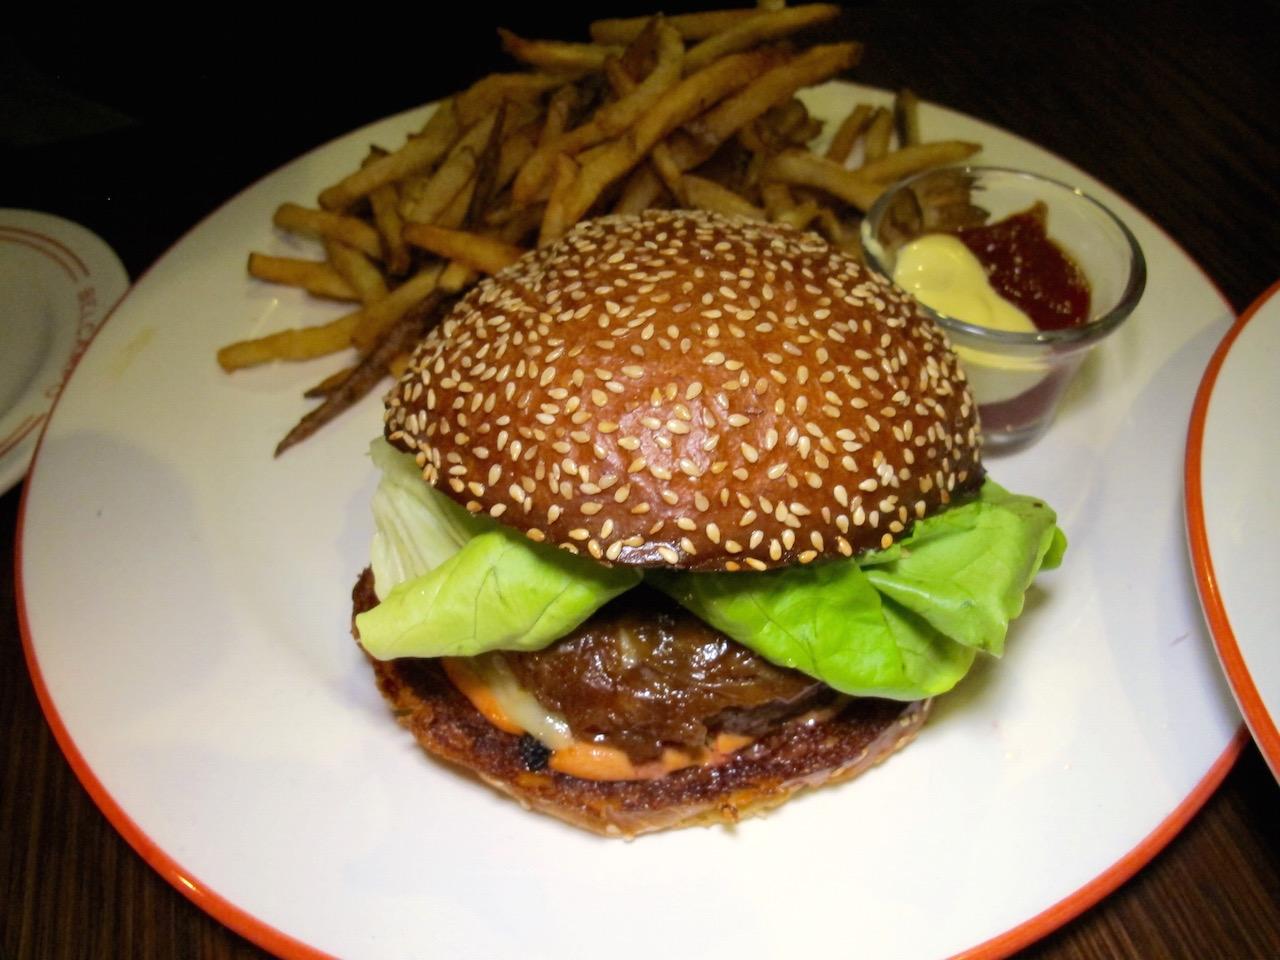 Belcampo Cheeseburger